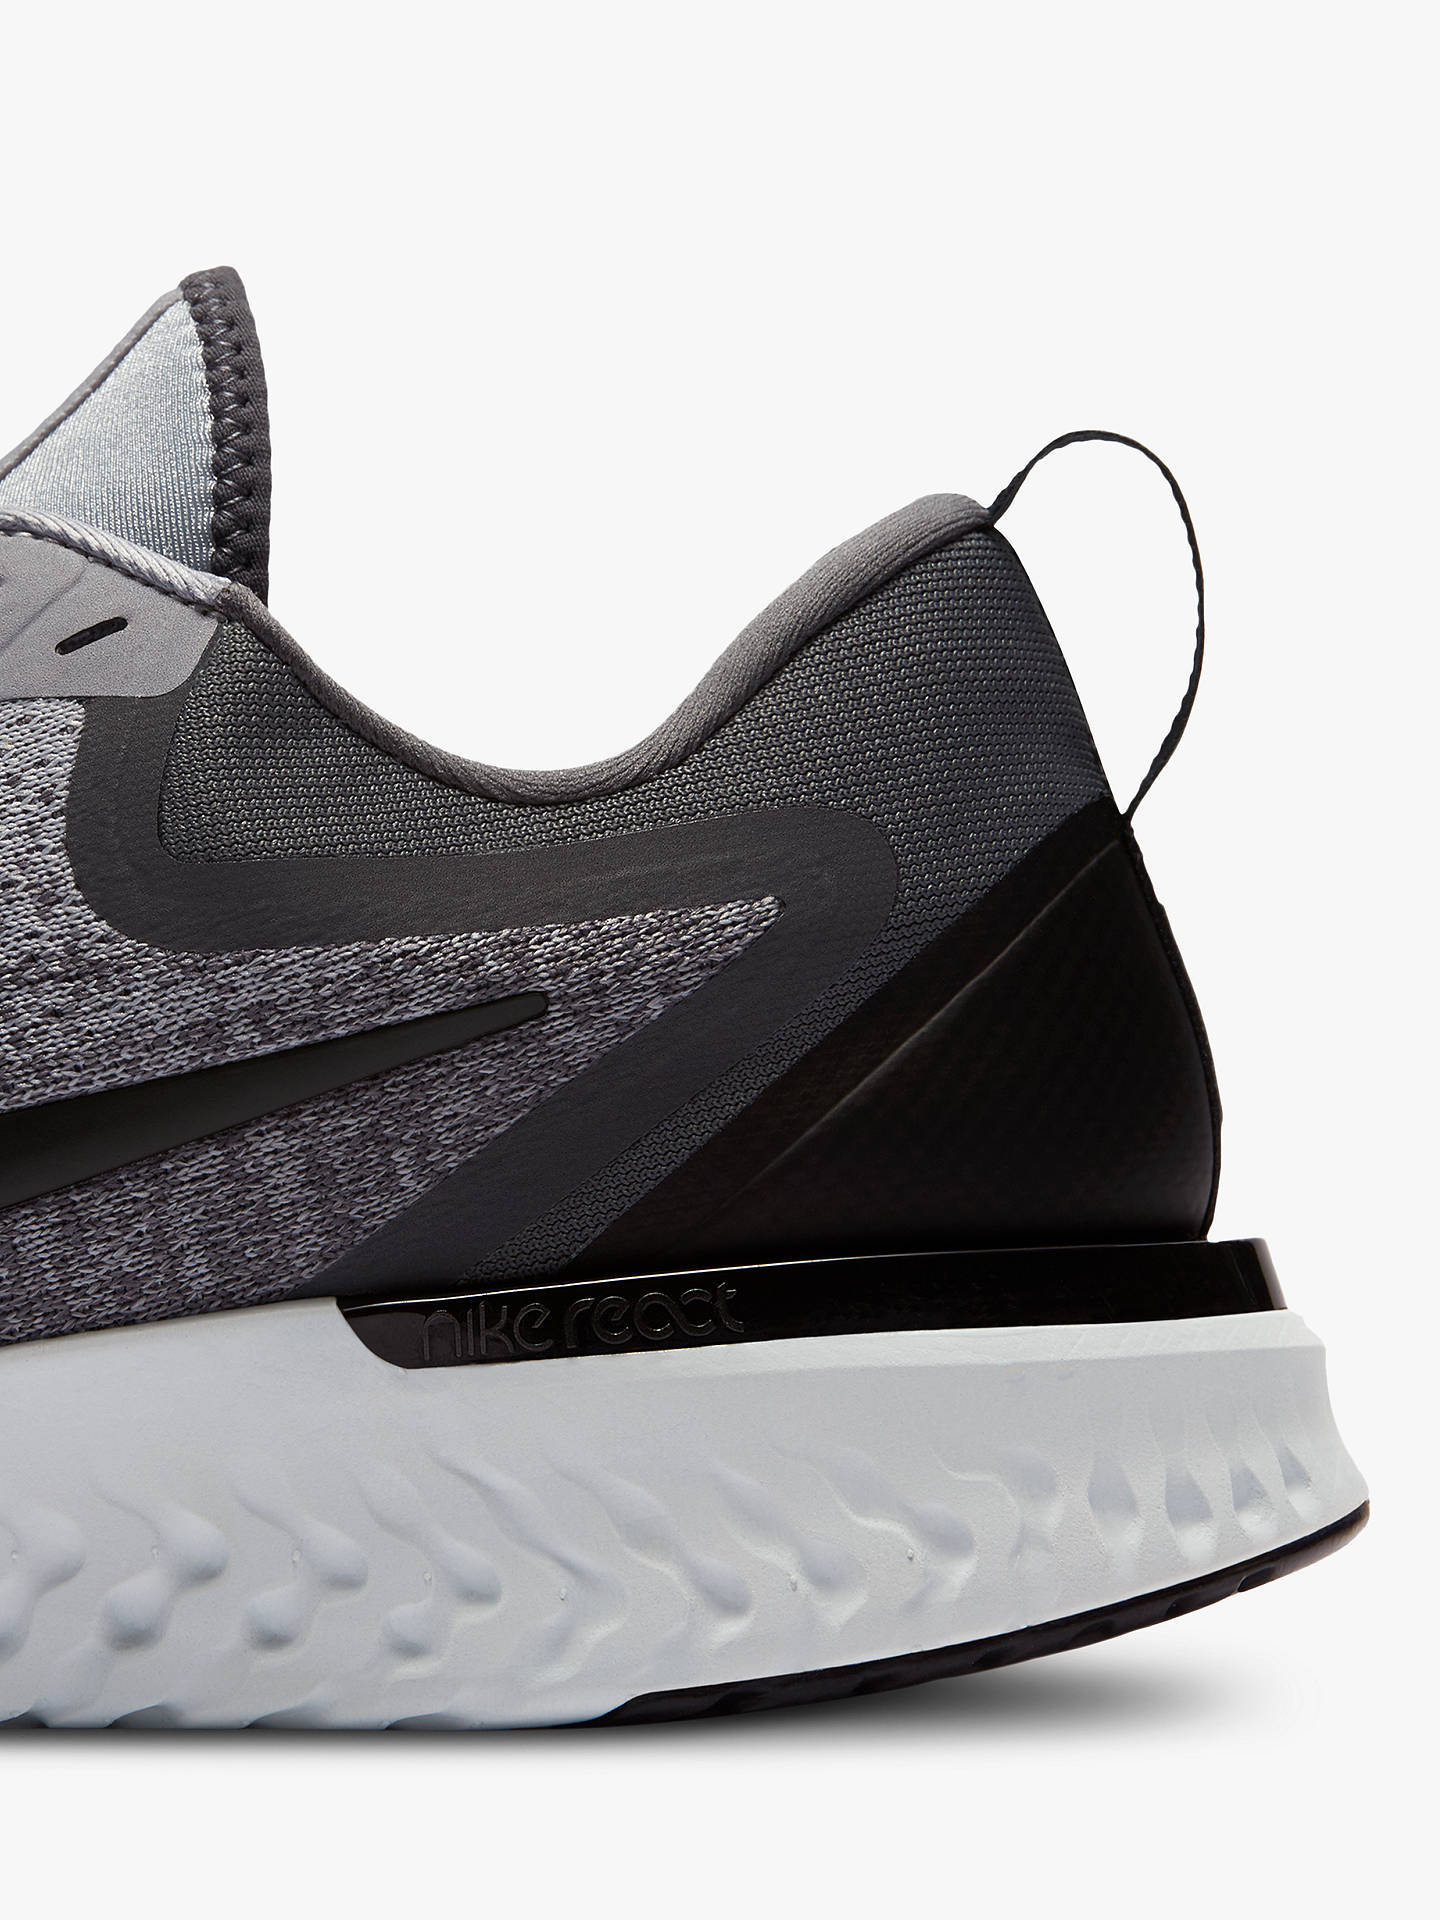 e2a625aadf99 Nike Odyssey React Men s Running Shoe at John Lewis   Partners